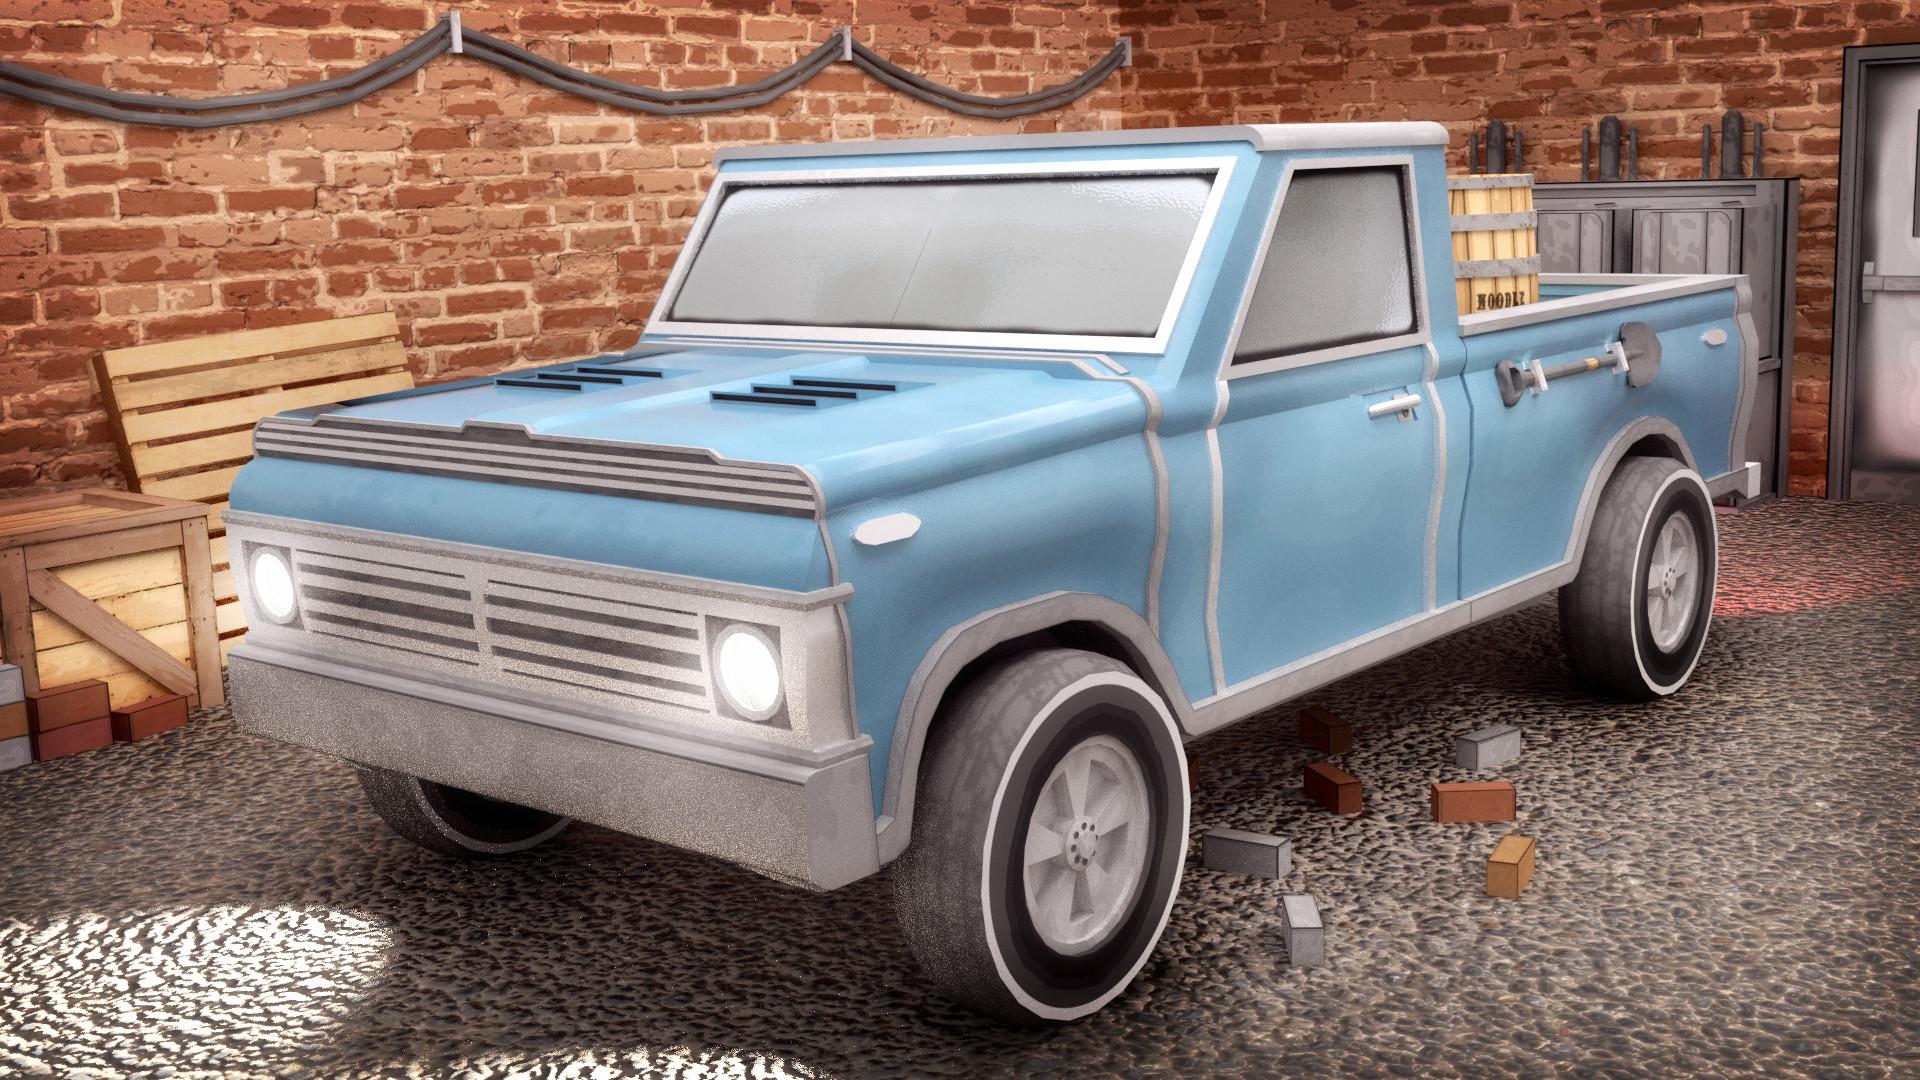 Truck2.jpg.ac376b8969db506afd33c0113565bc14.jpg